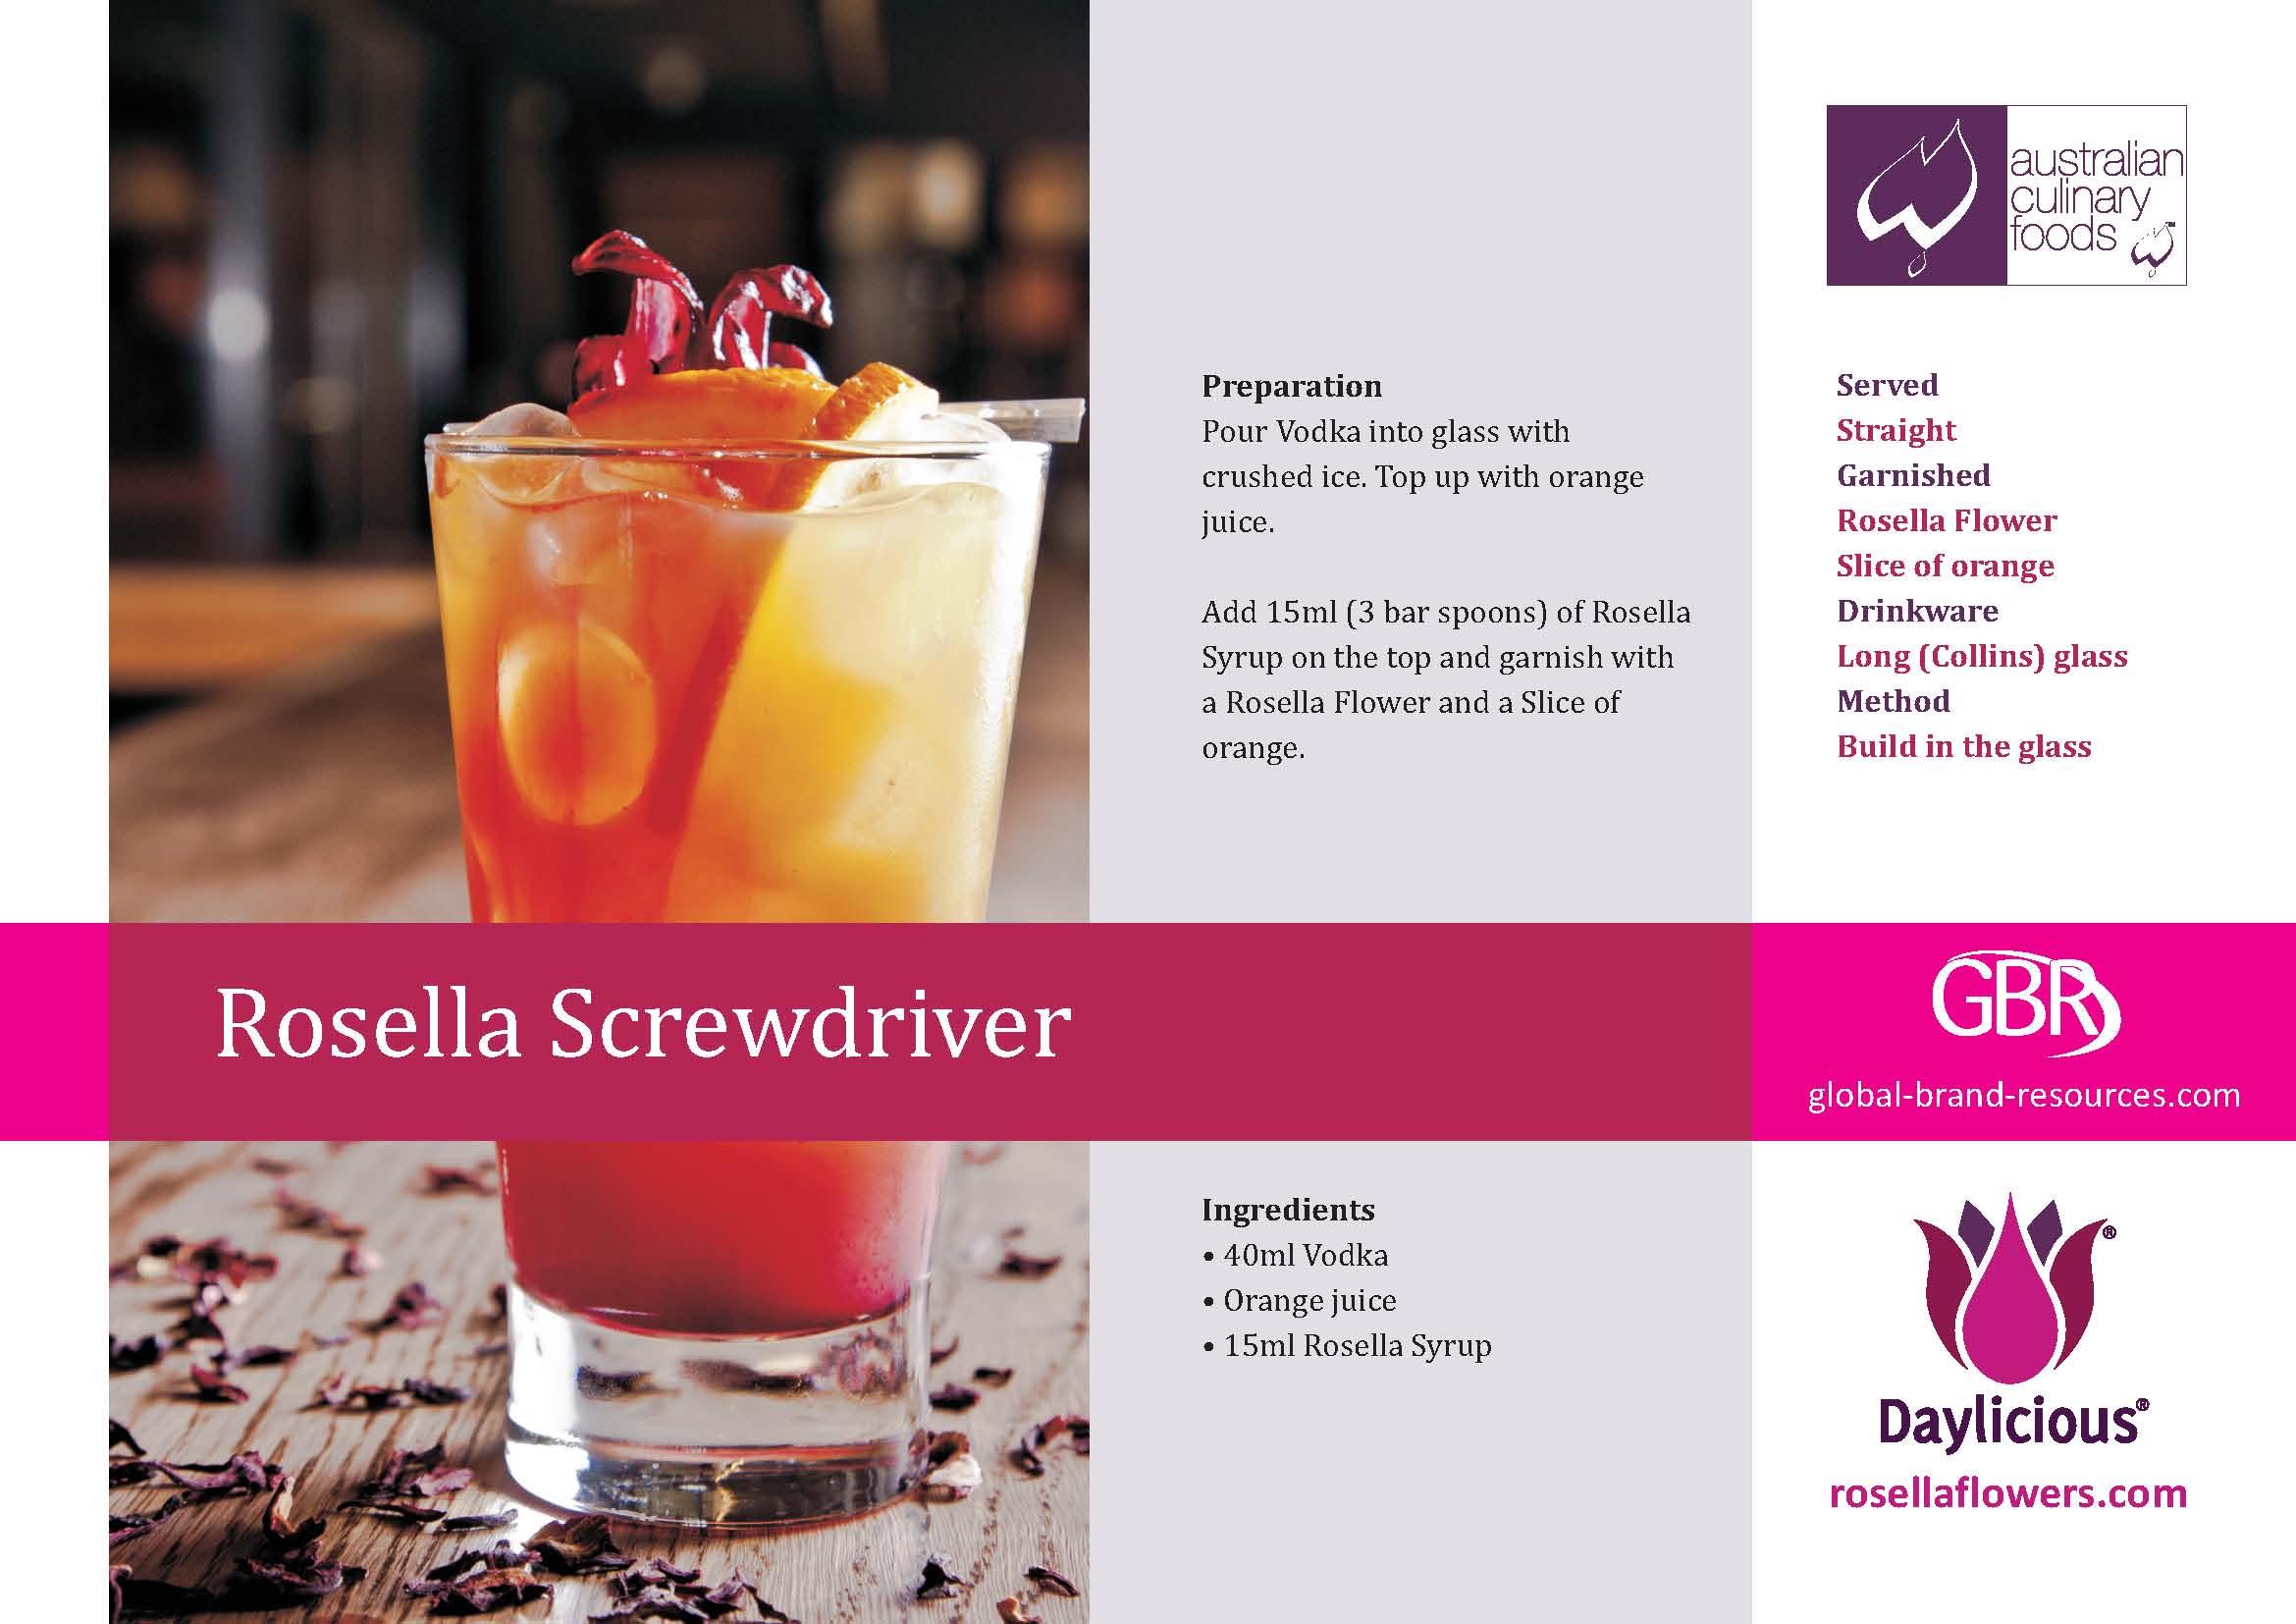 Rosella Screwdriver